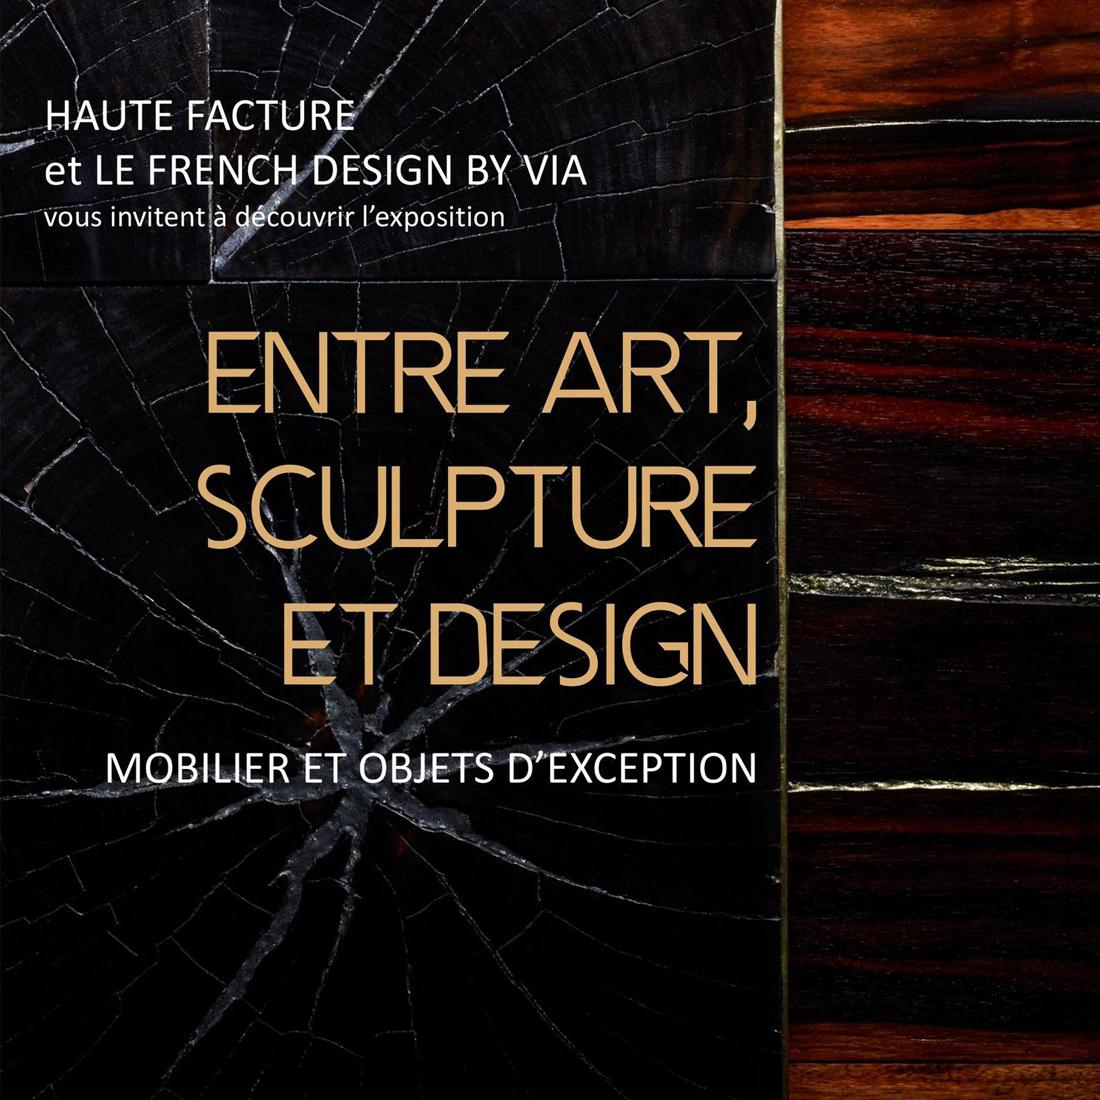 SB26 Haute Facture et French Design by VIA